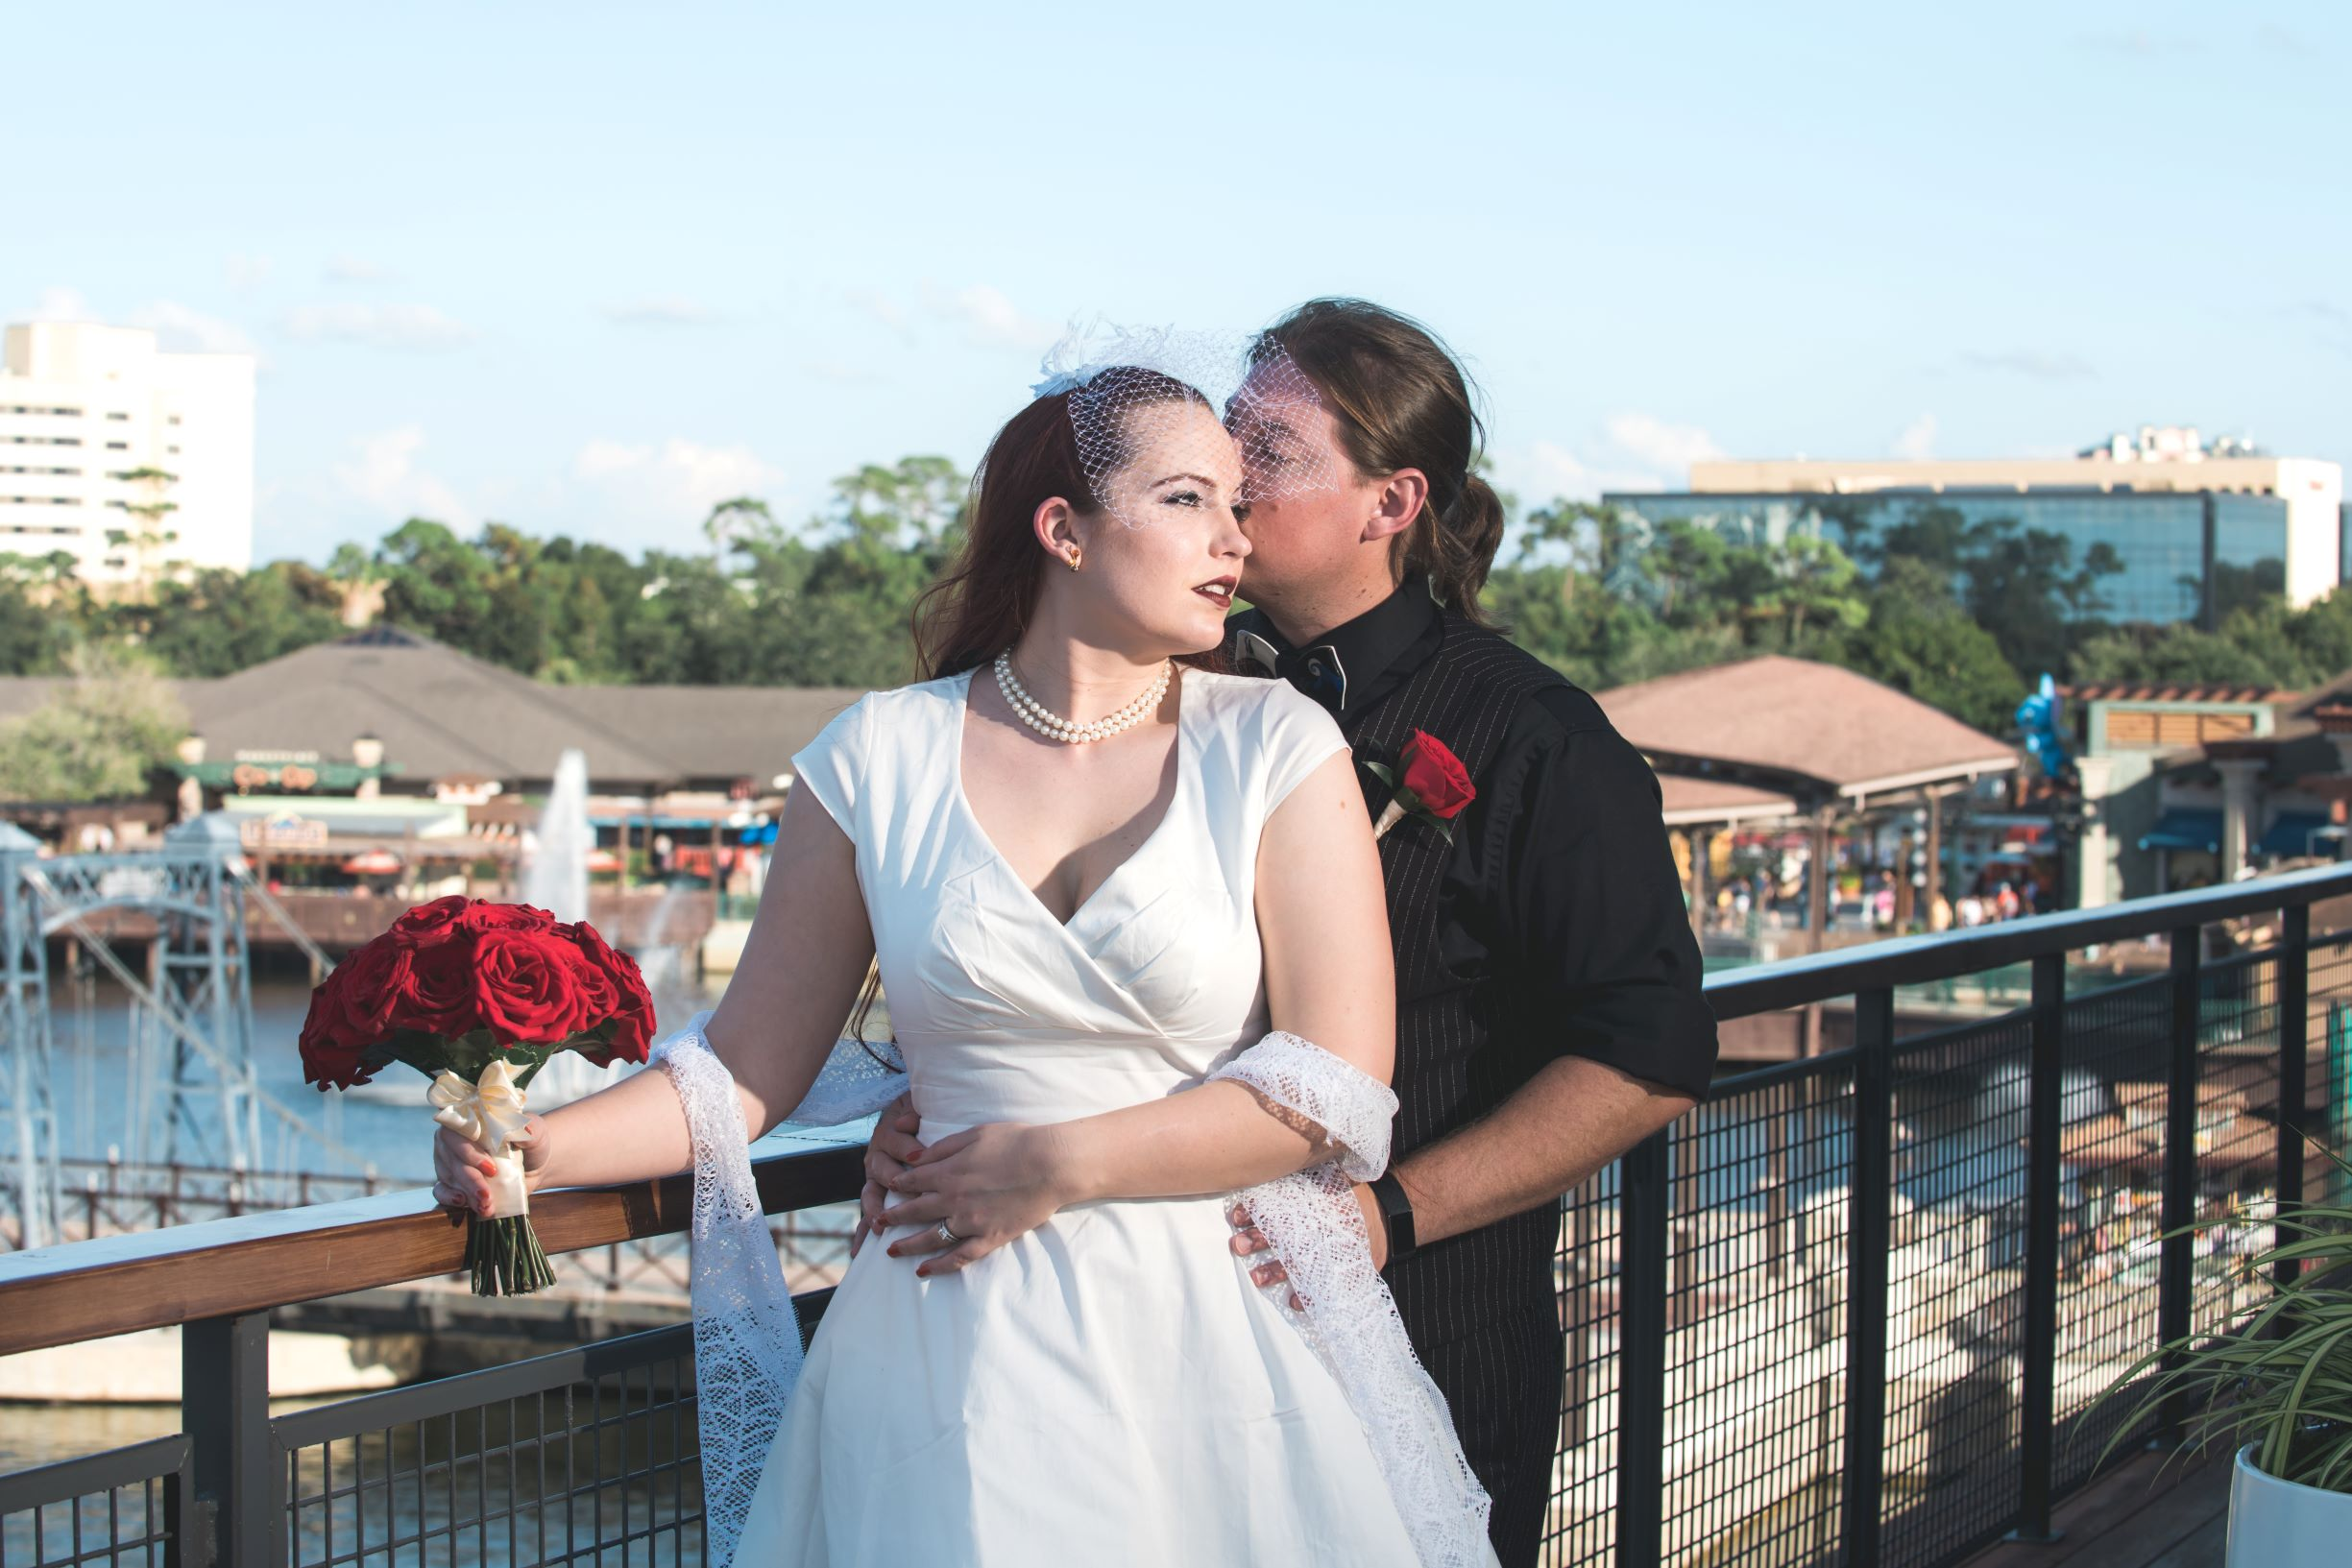 Halloween in Orlando | The Paddlefish Wedding of Nicole and Cory